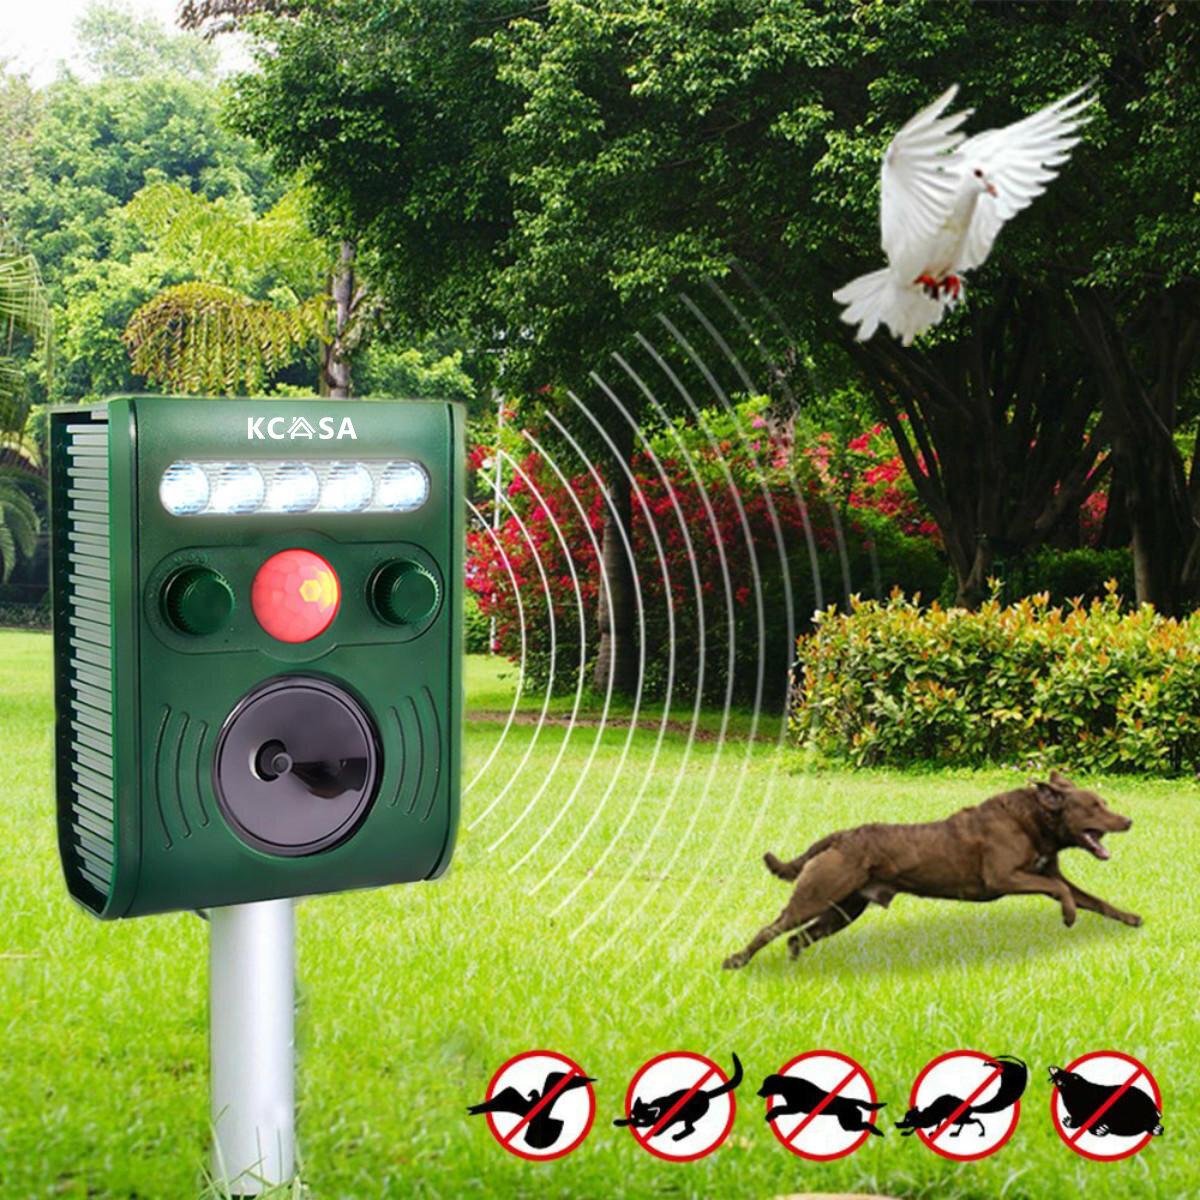 KCASA KC-JK369 สวน อัลตราโซนิก PIR เซนเซอร์ โซลา Animal Dispeller ไฟกระพริบแข็งแรง สุนัข Repeller